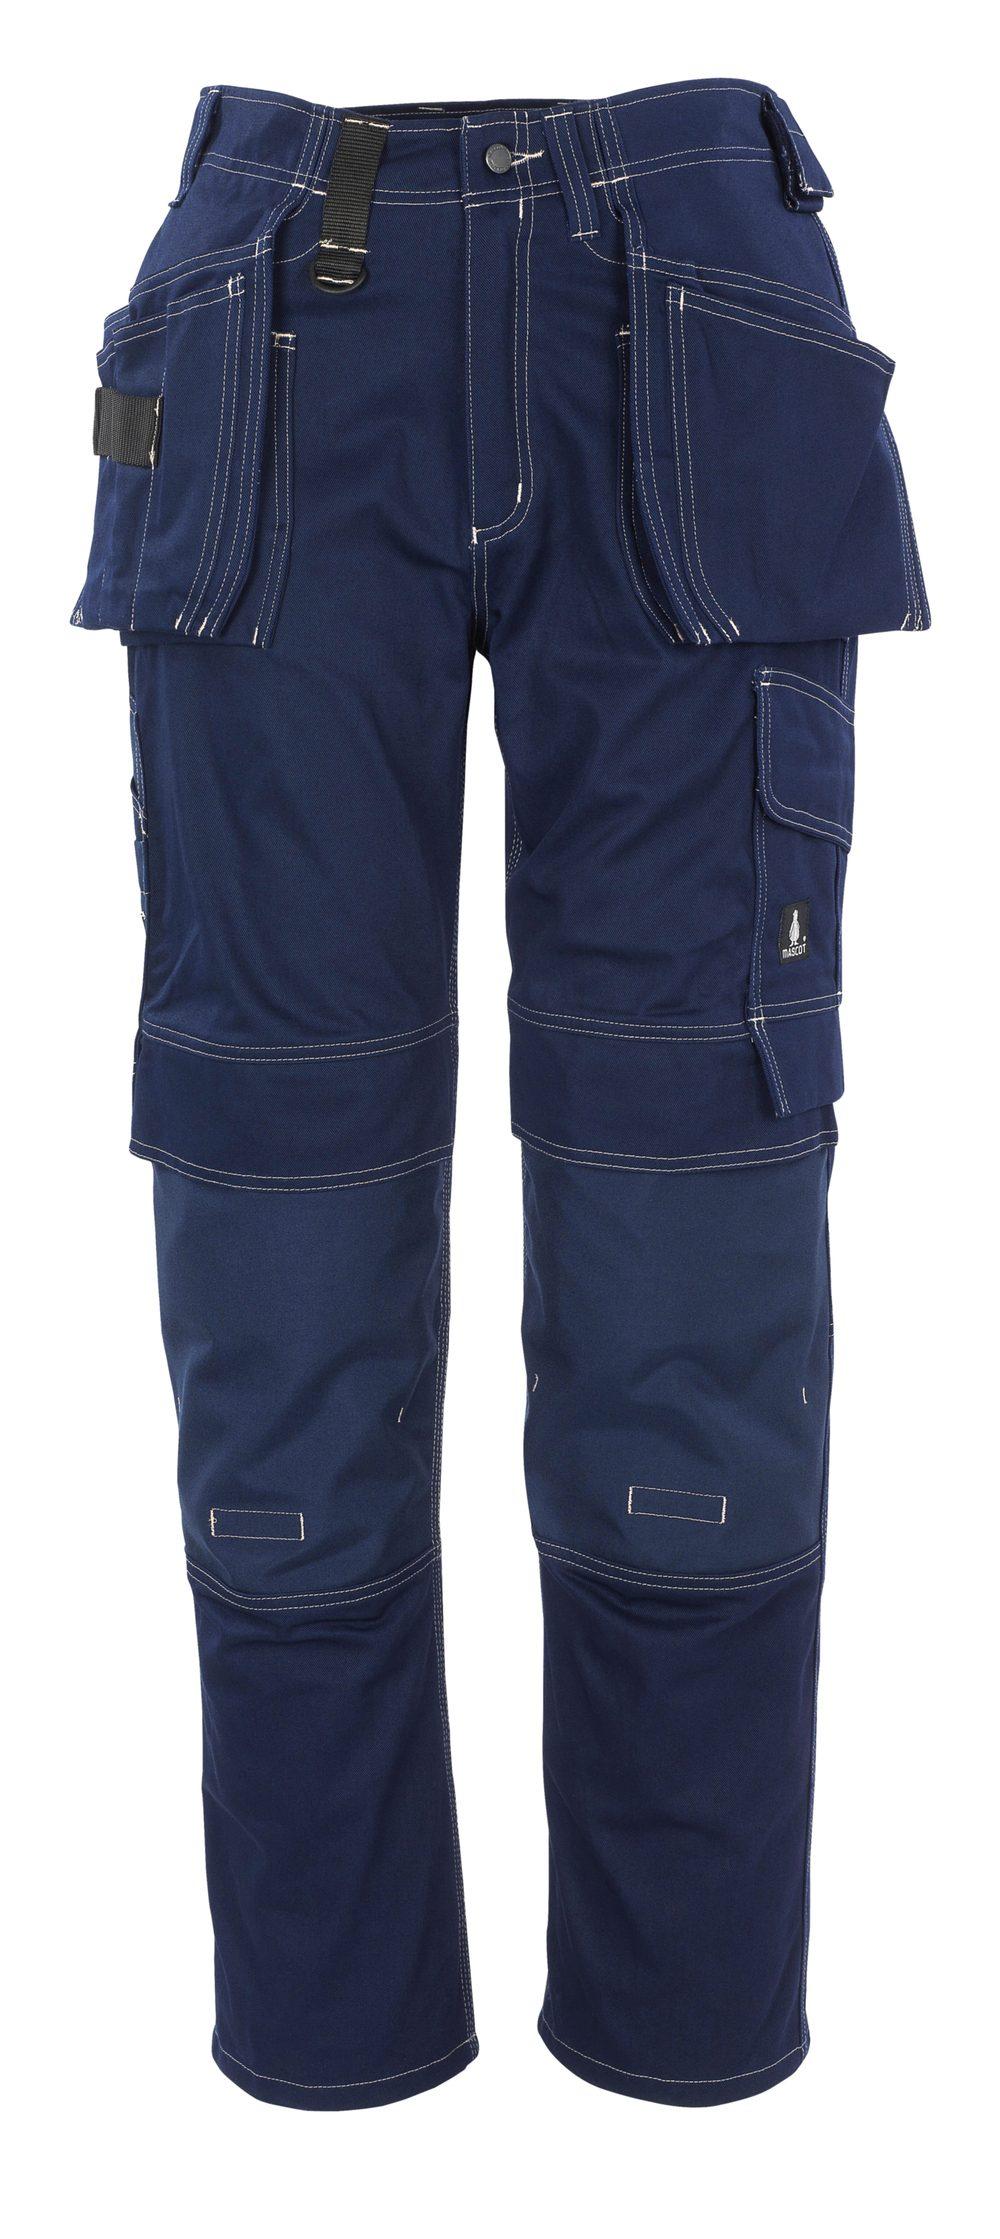 Mascot Atlanta Pants Navy Blue